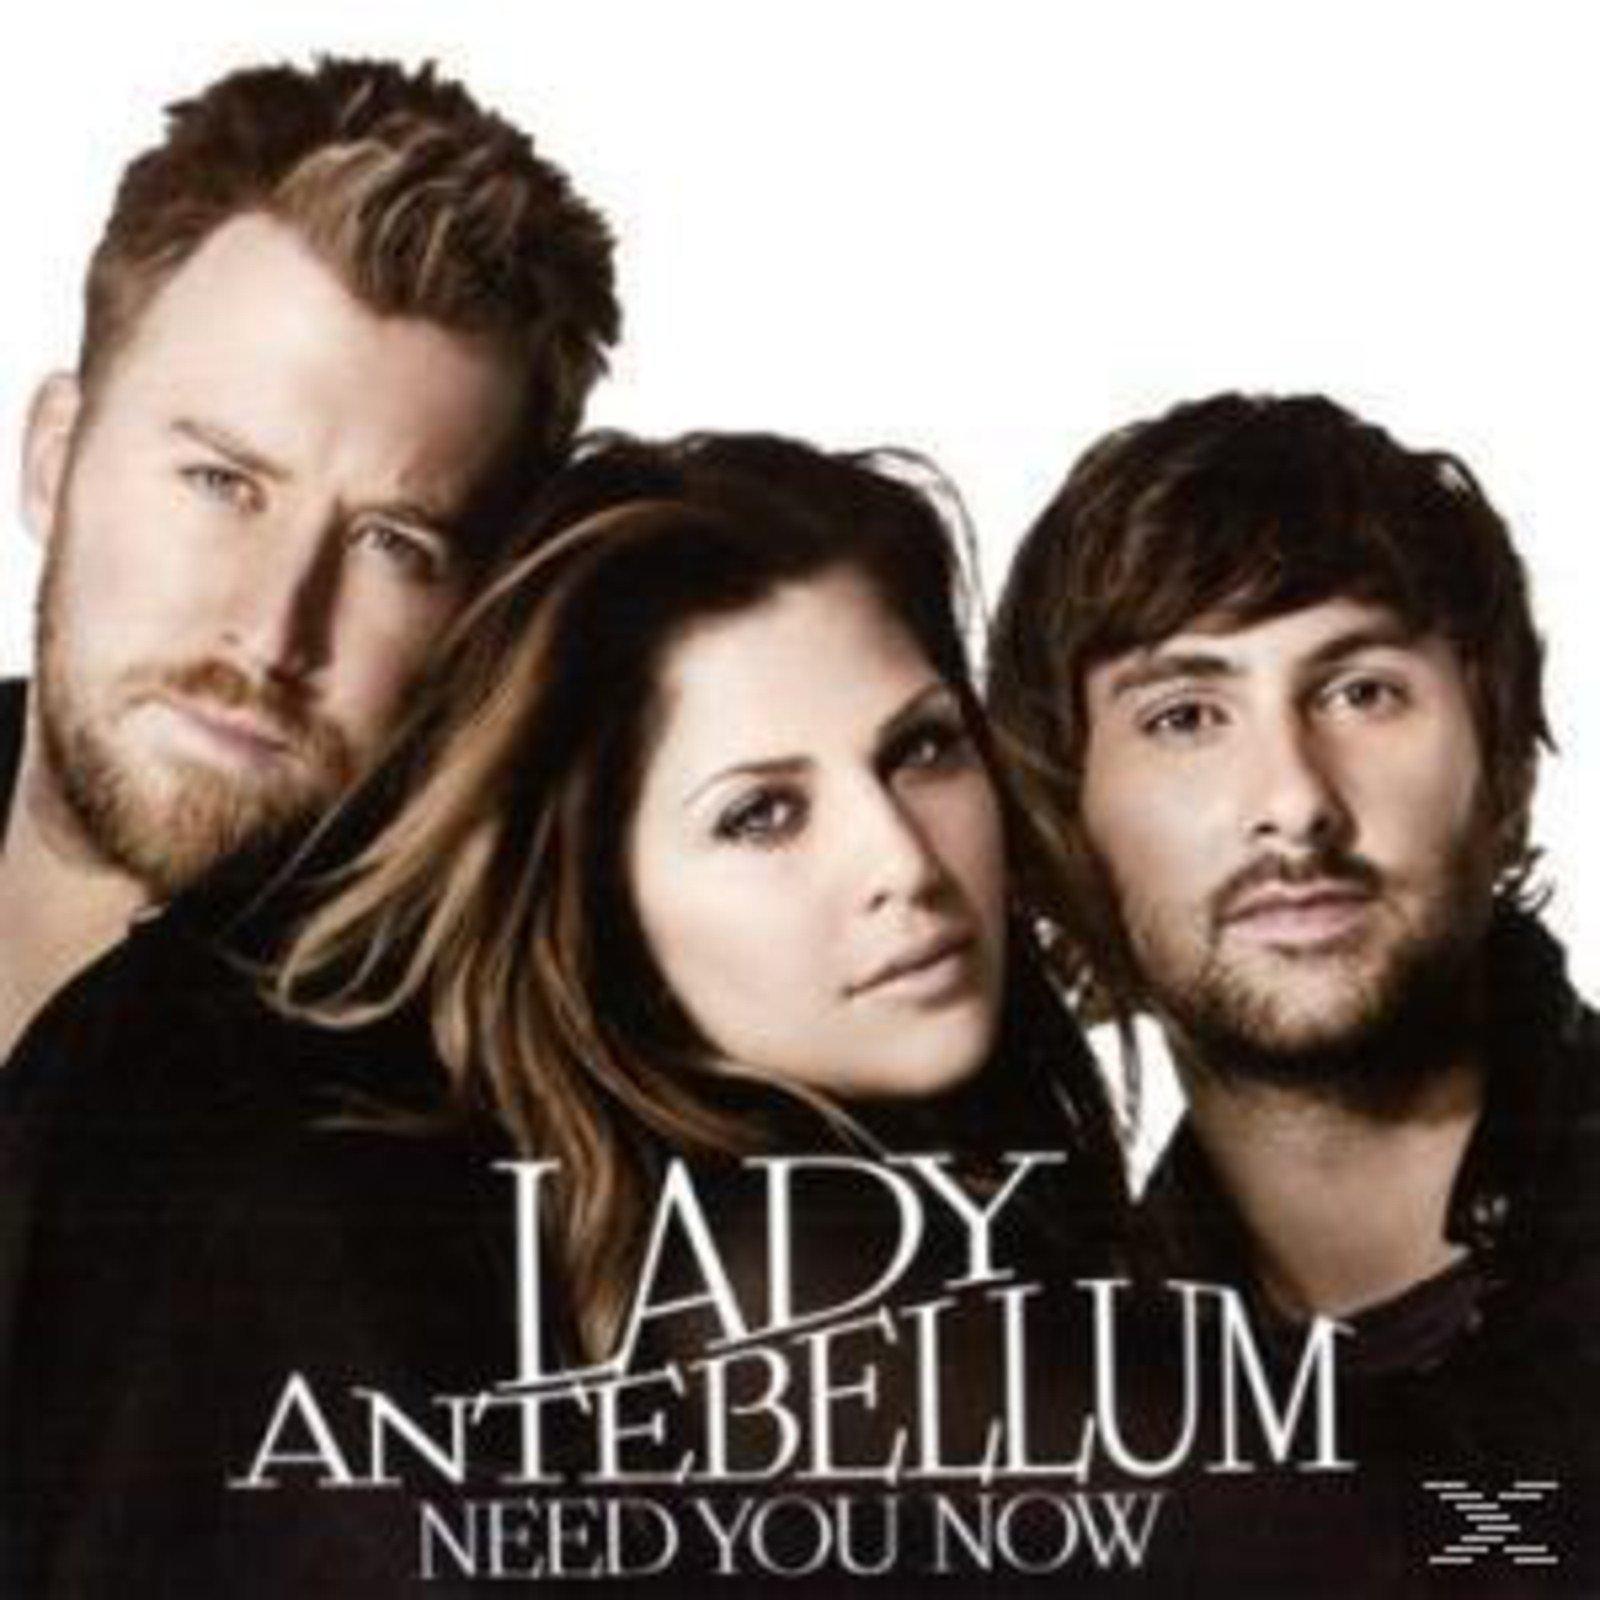 Lady Antebellum - Lady Antebellum - Need You Now [CD] 3